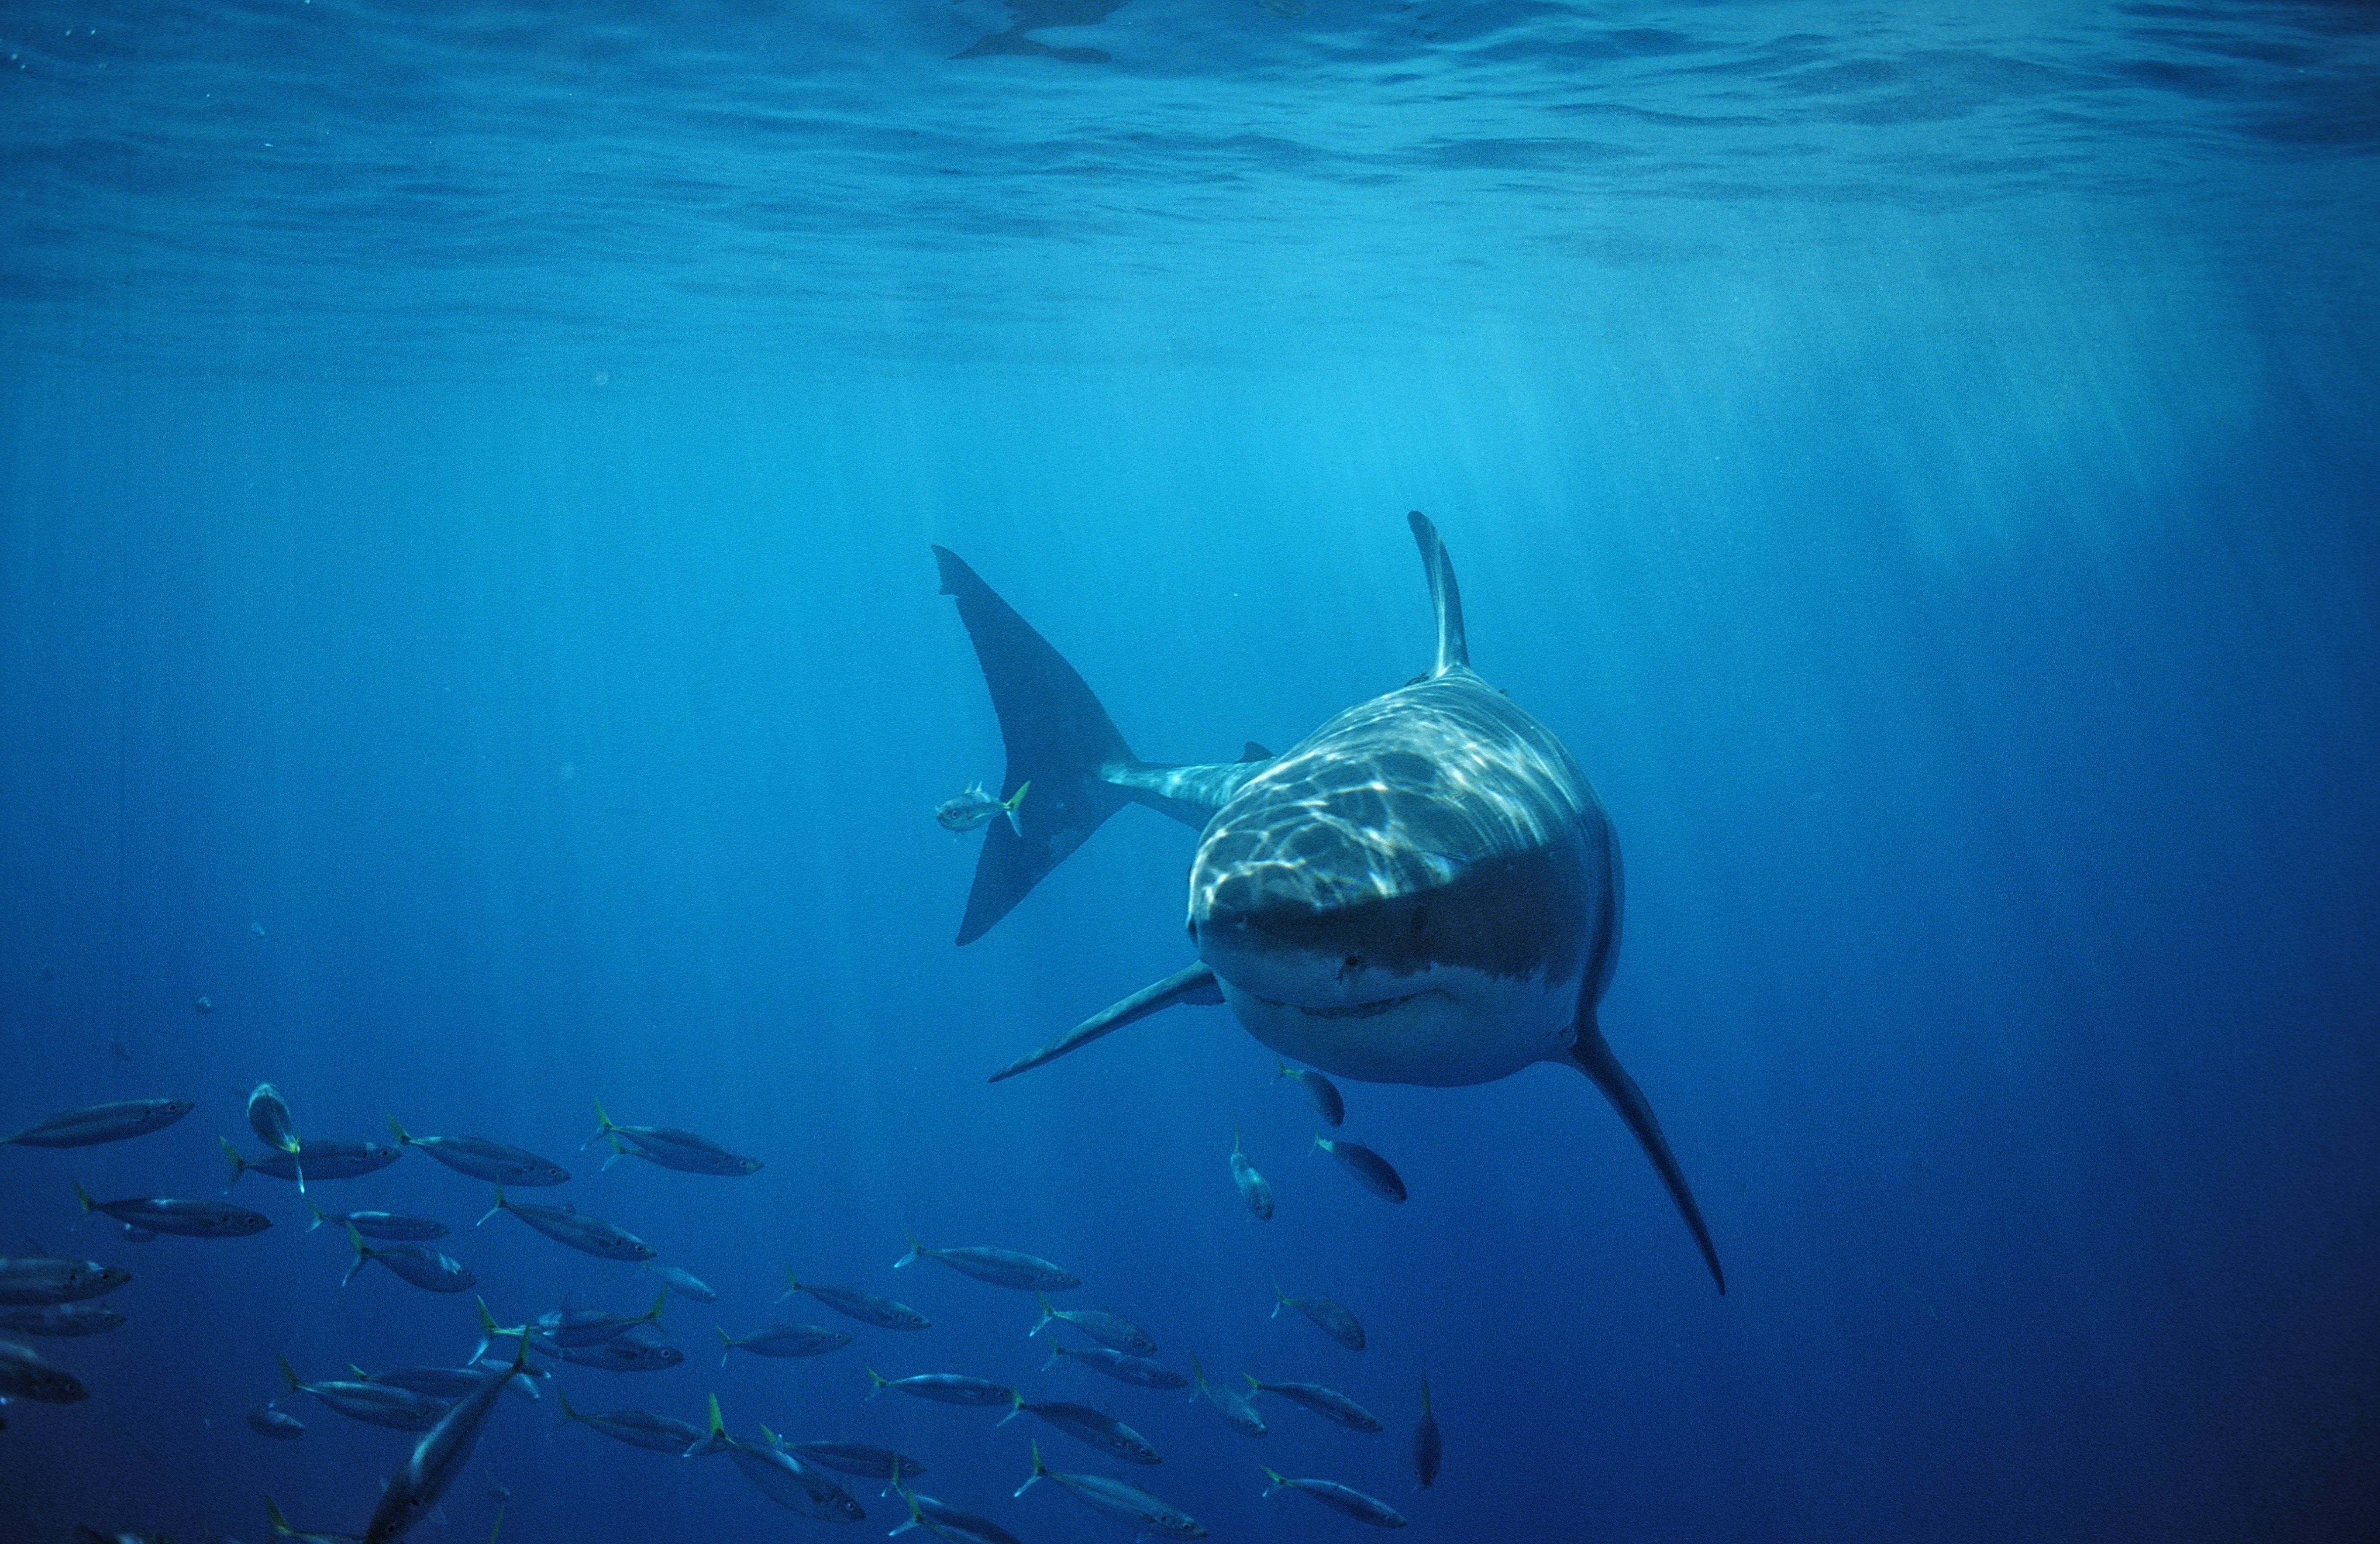 Shark attack kills surfer off Australia's east coast